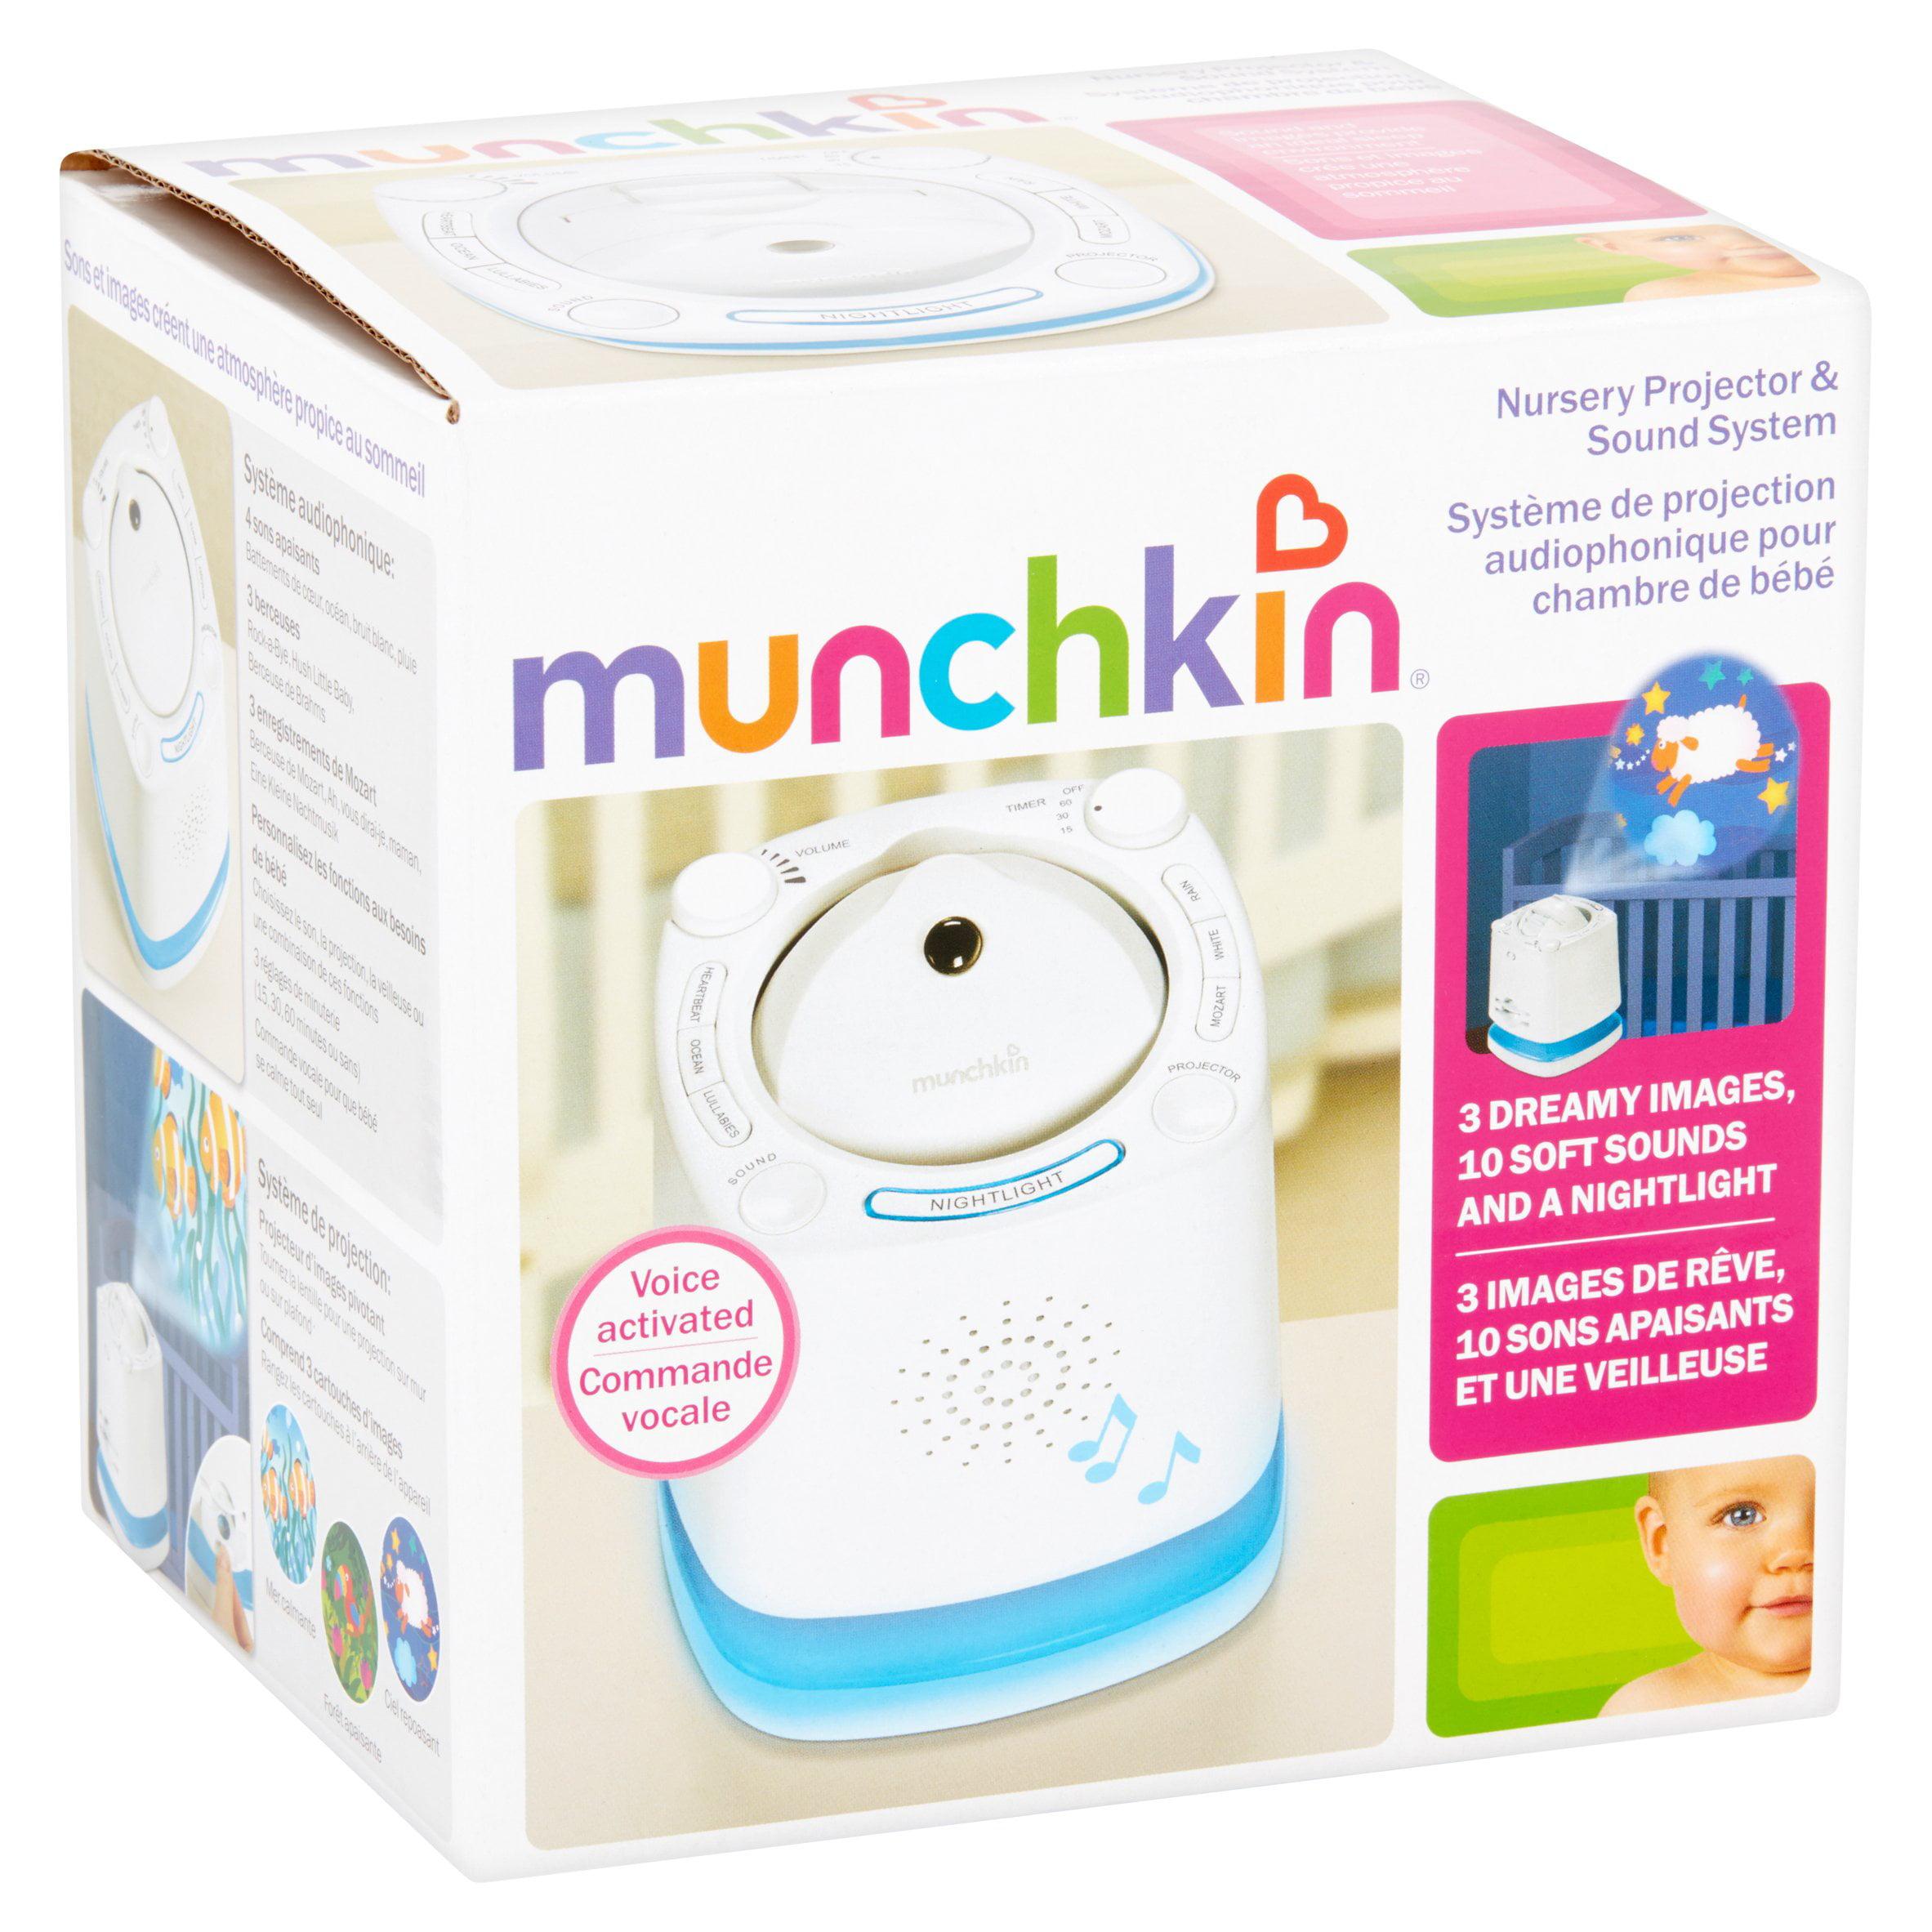 munchkin nursery projector & sound system instruction manual